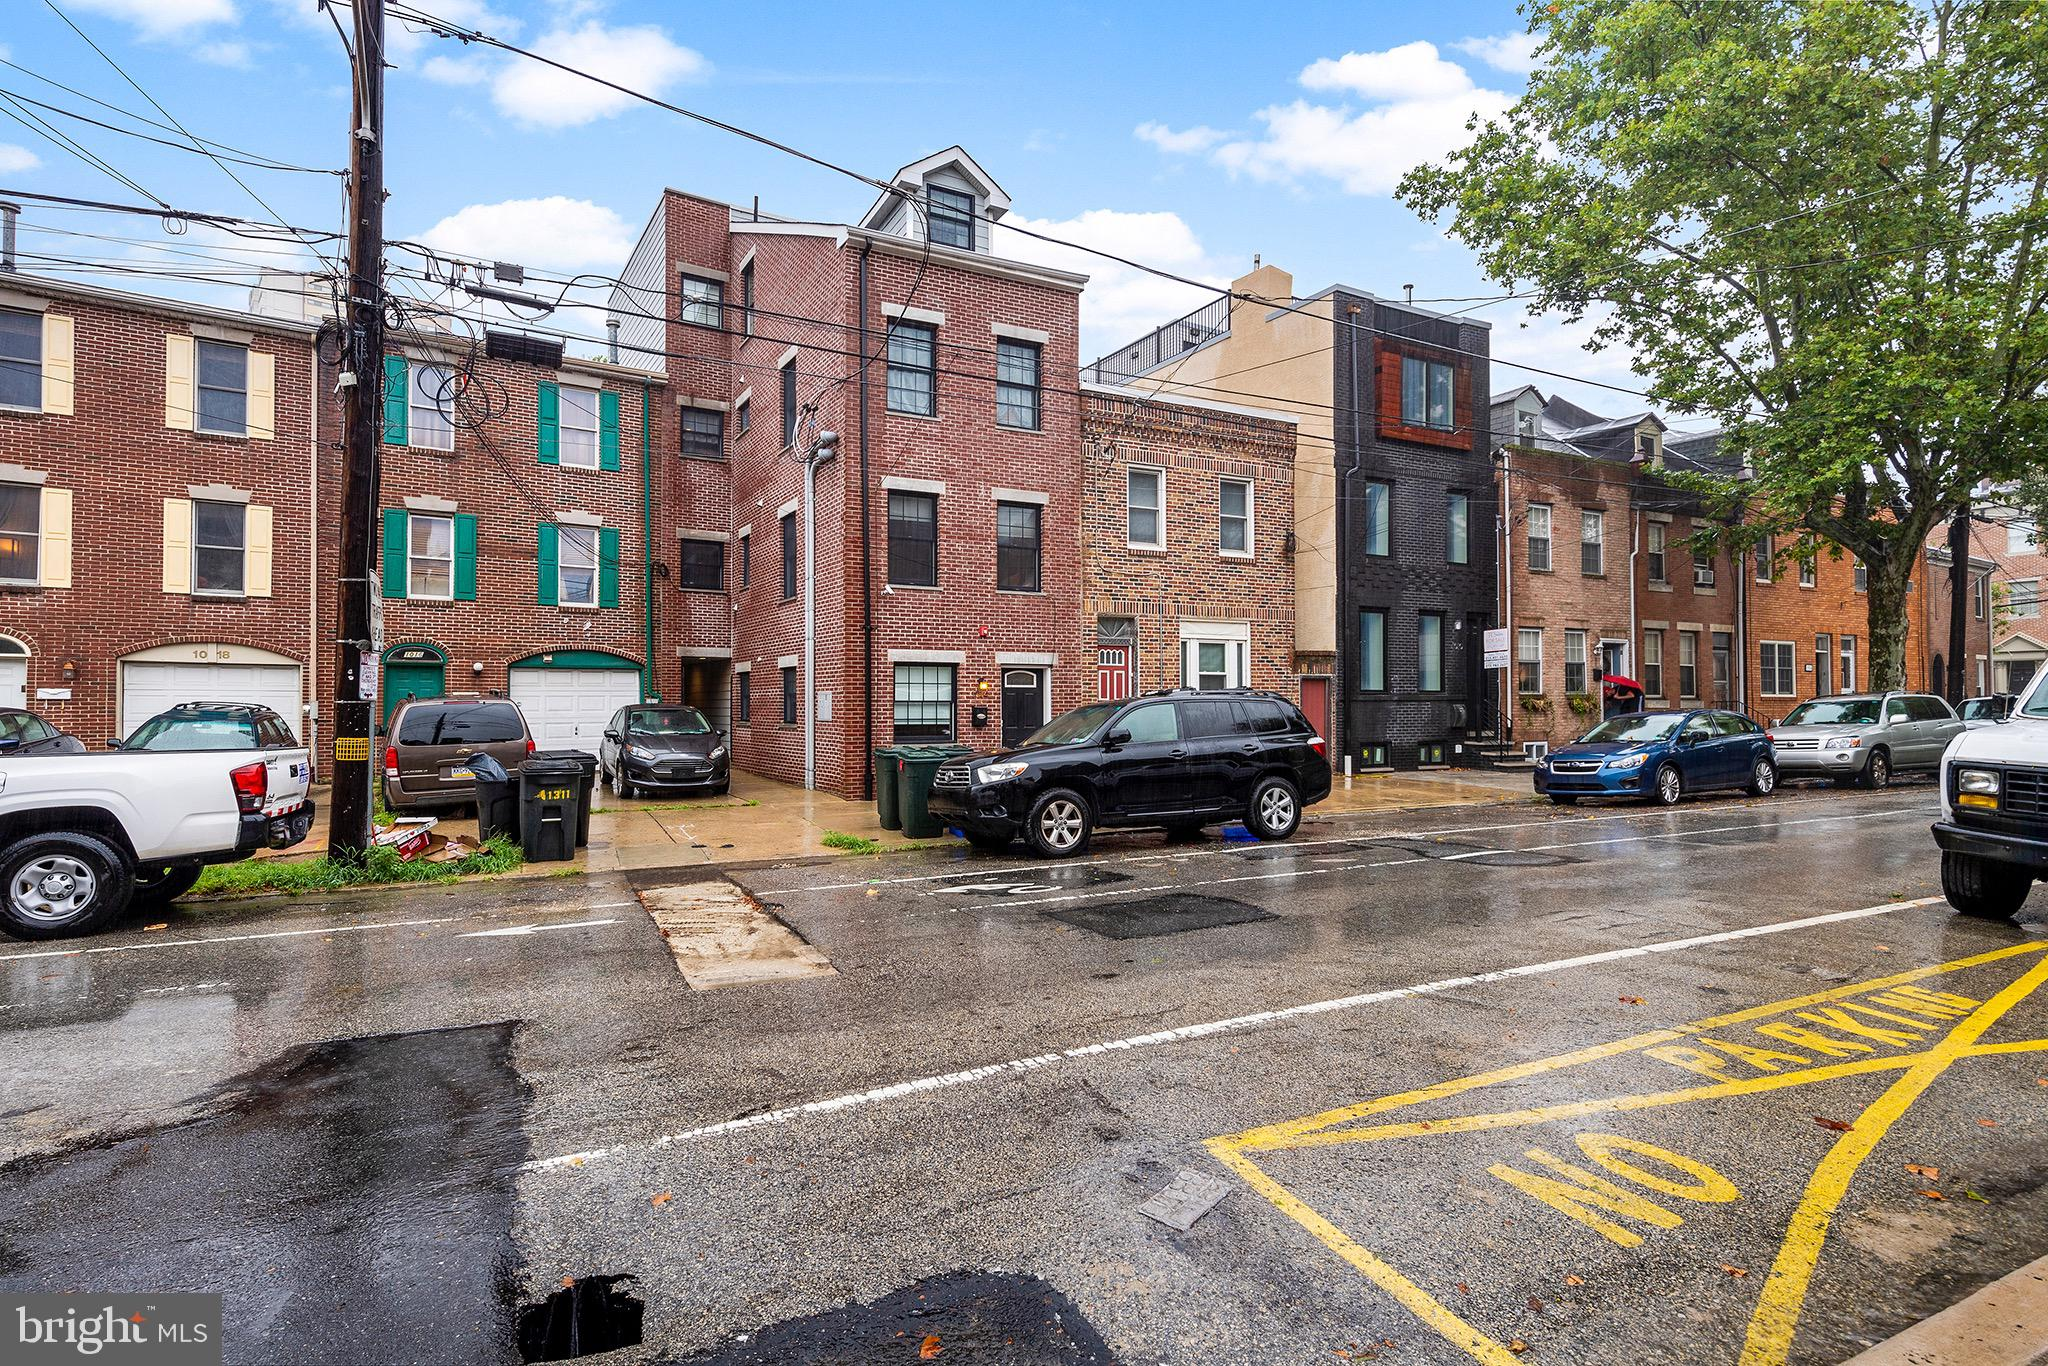 1014 E Moyamensing Ave, Philadelphia, PA, 19147